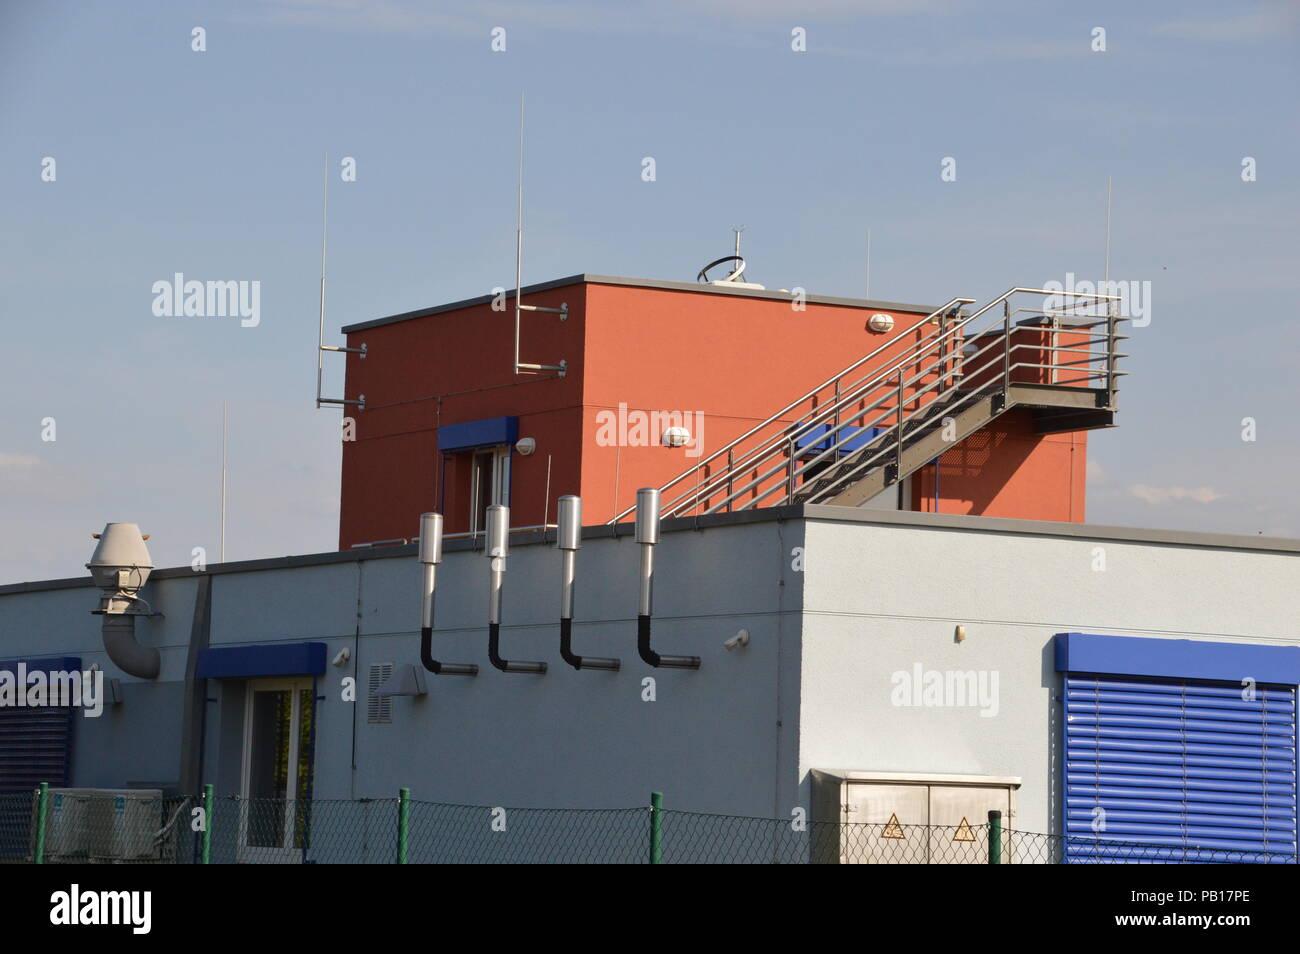 d8e8d7d338 goerlitz saxony germany 2018 deutscher wetterdienst wetterwarte German  weather service weather station - Stock Image